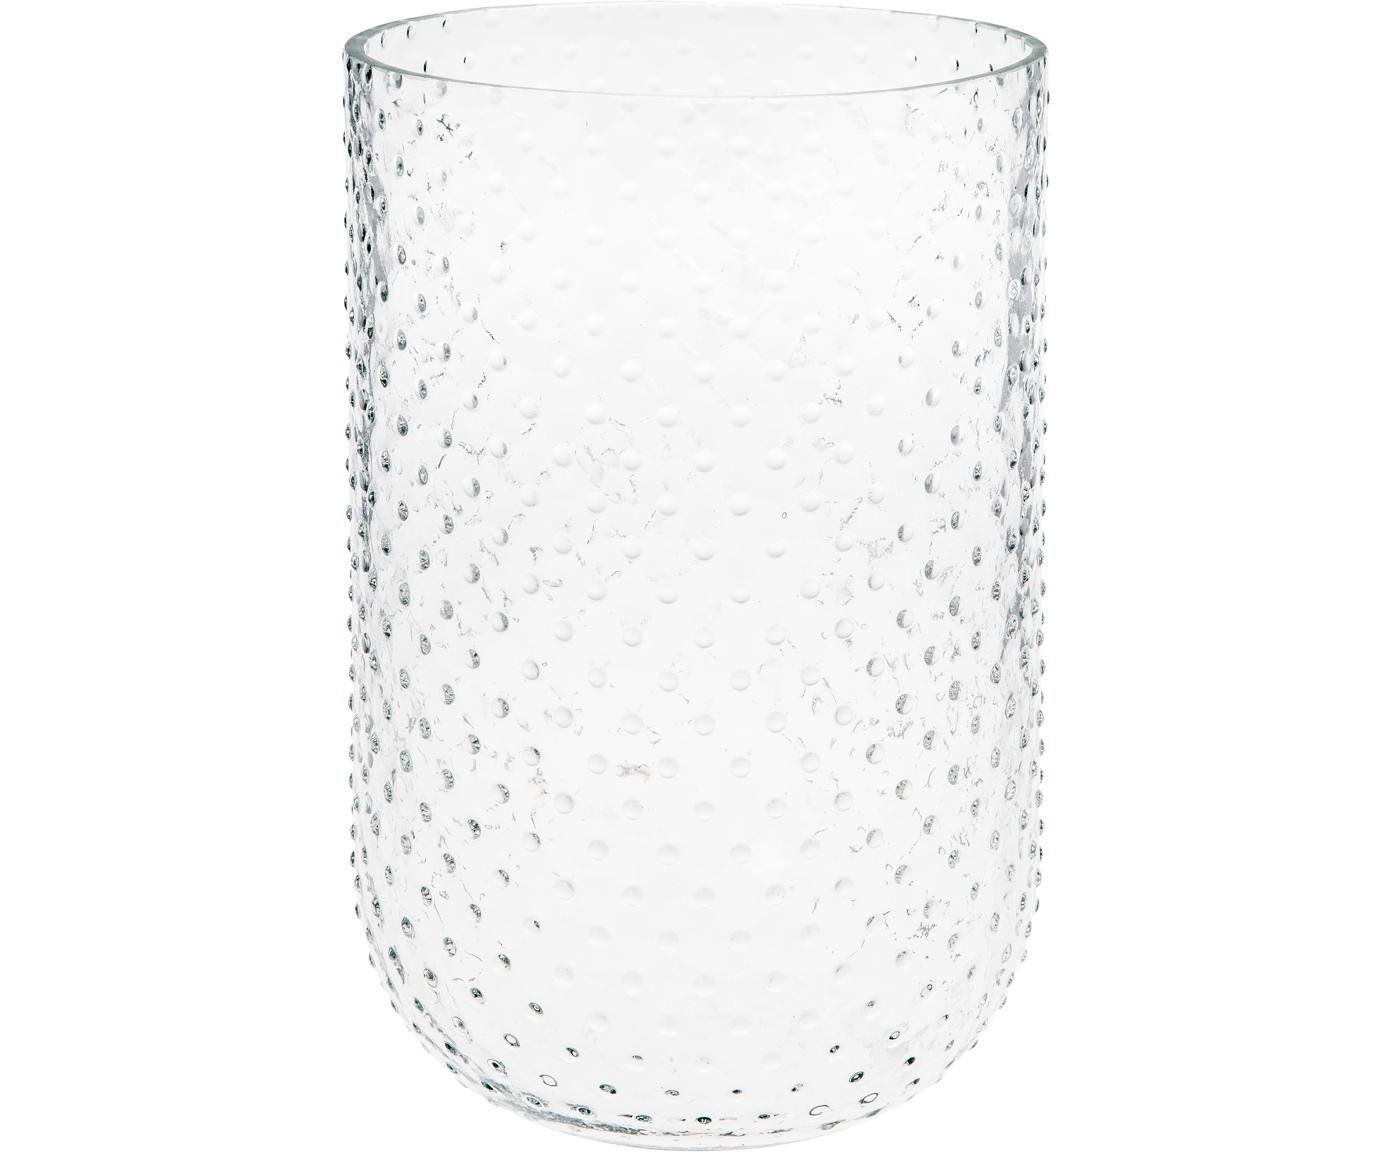 Glazen vaas Bumble, Glas, Transparant, Ø 15 x H 24 cm